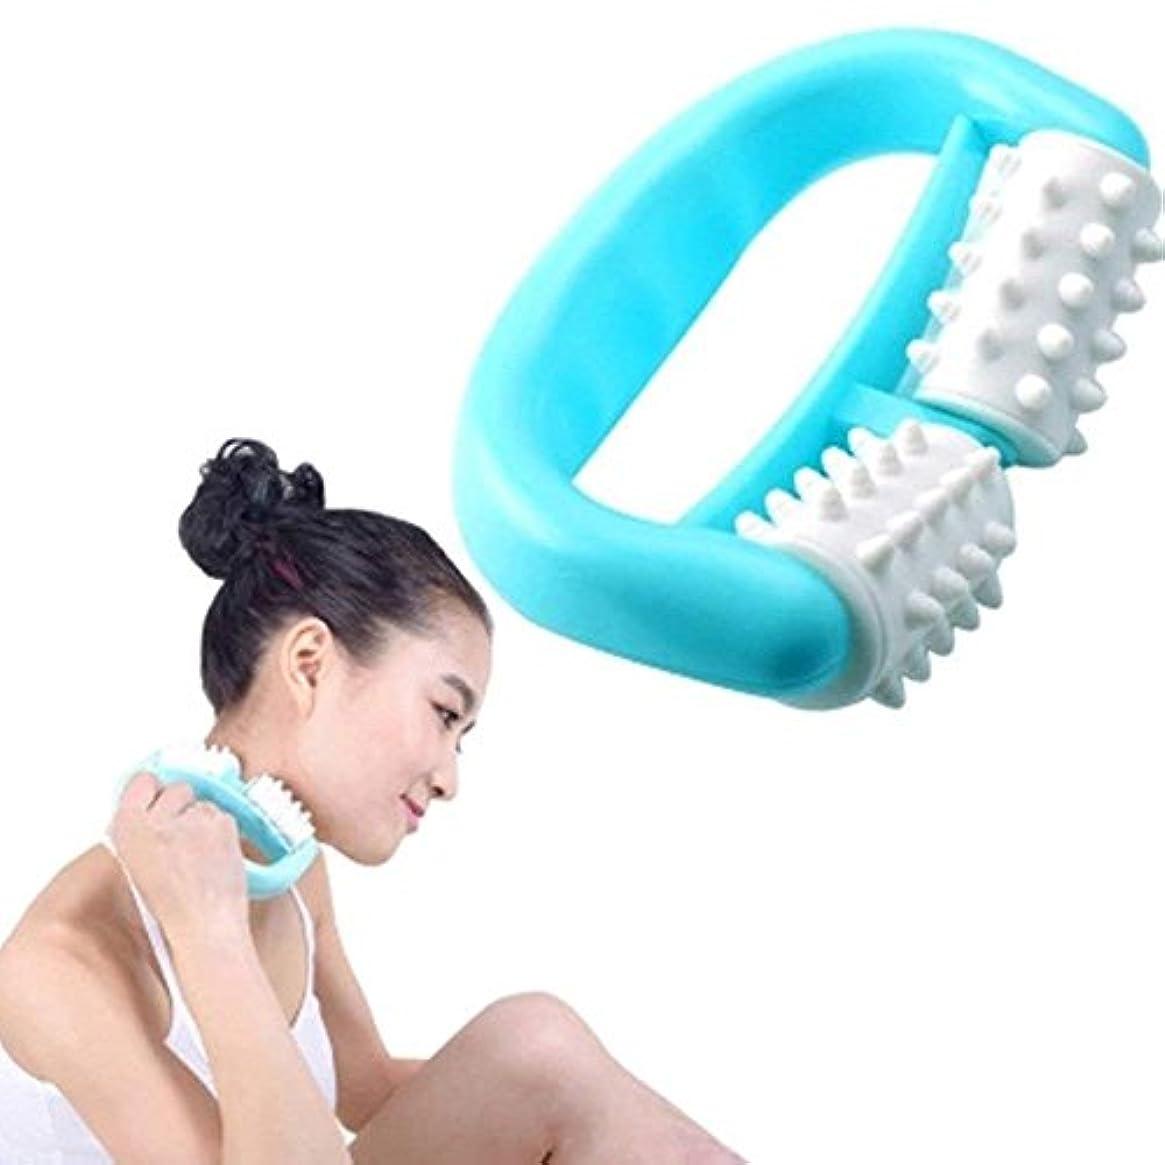 FC-工場 マッサージ ブラシ筋膜リリース 脂肪除去 ボディシェイプ  足 ほぐし 血行促進 浮腫み解消  疲労回復 ローラー ダイエットボディローラー セルフケア